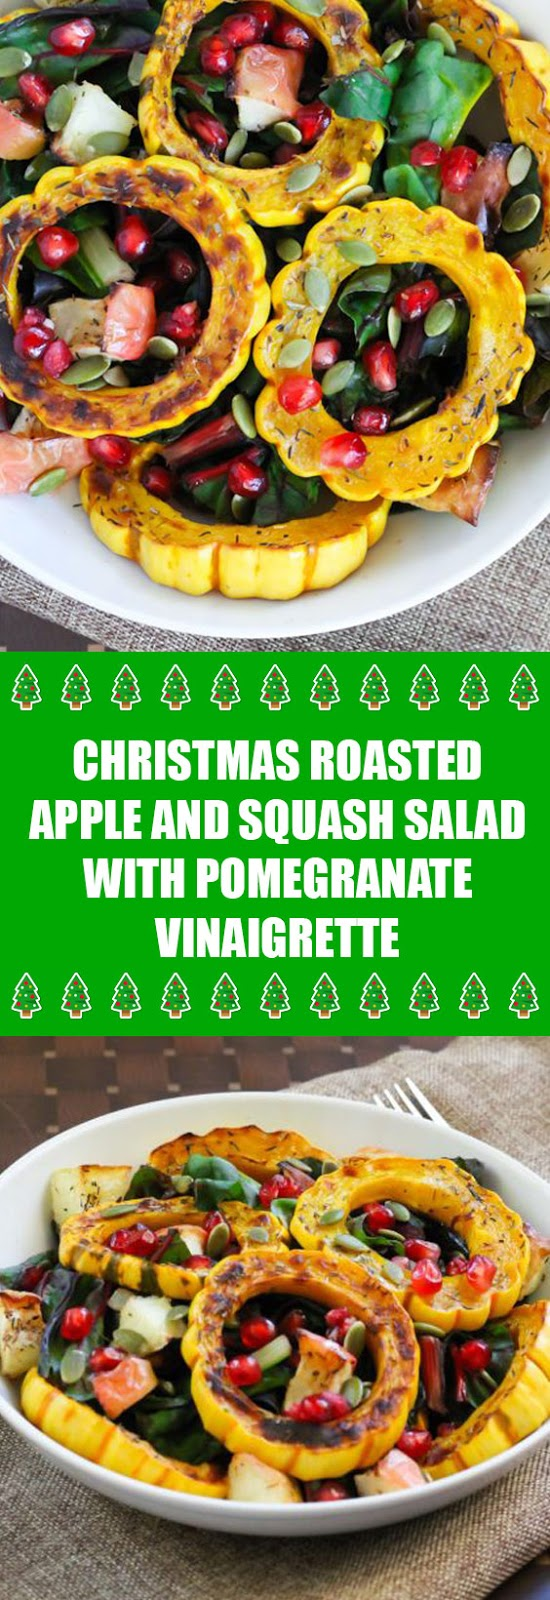 Christmas Roasted Apple and Squash Salad with Pomegranate Vinaigrette